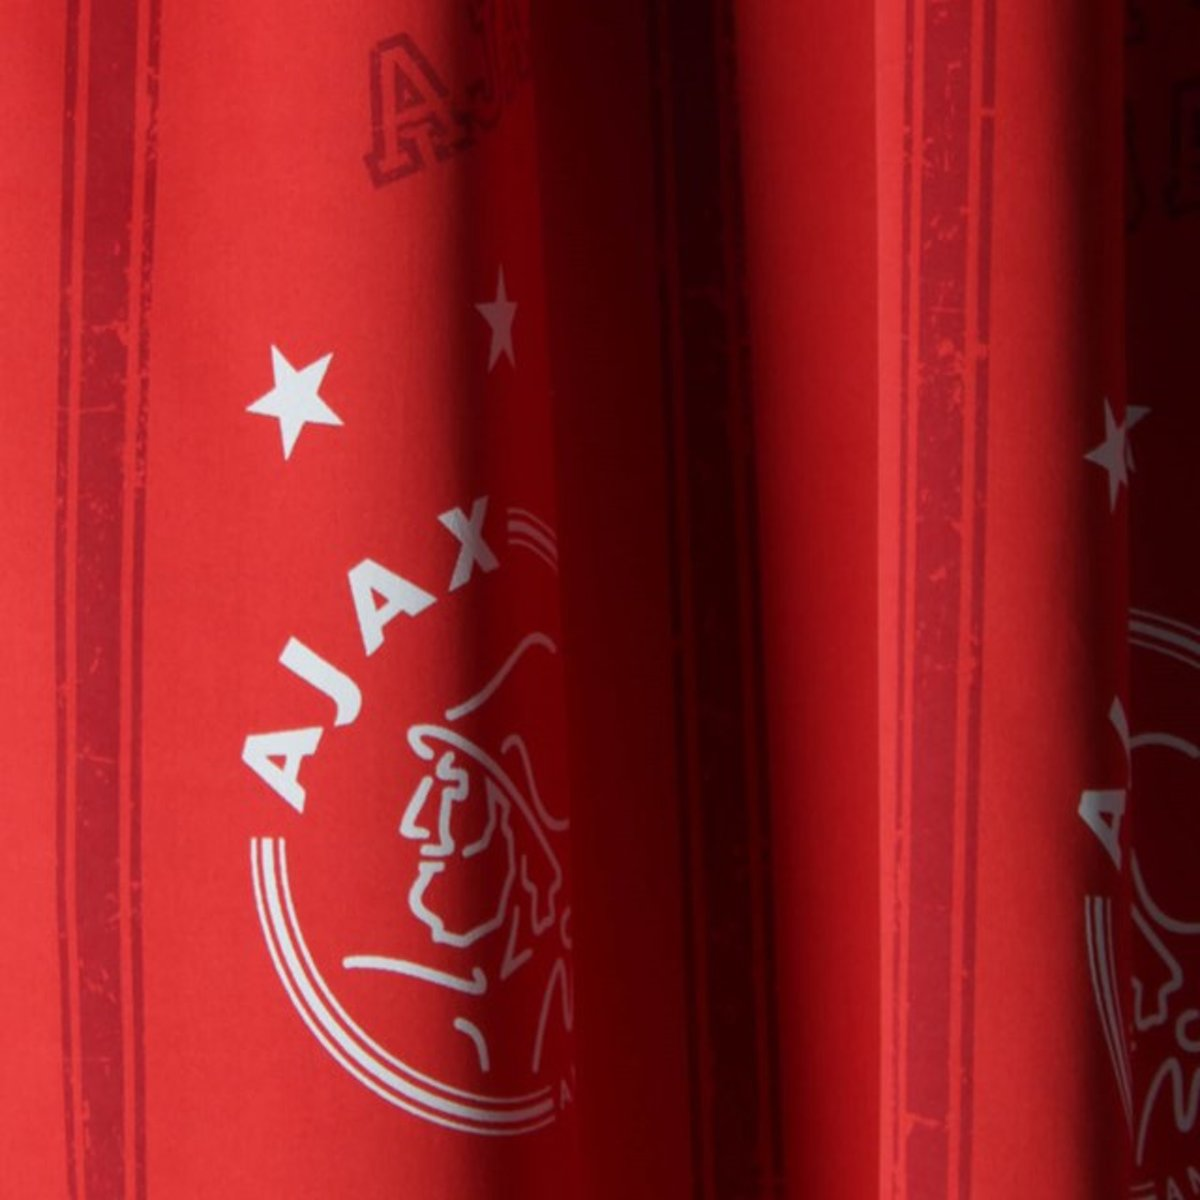 bolcom ajax gordijn rood met logo 150x260 cm